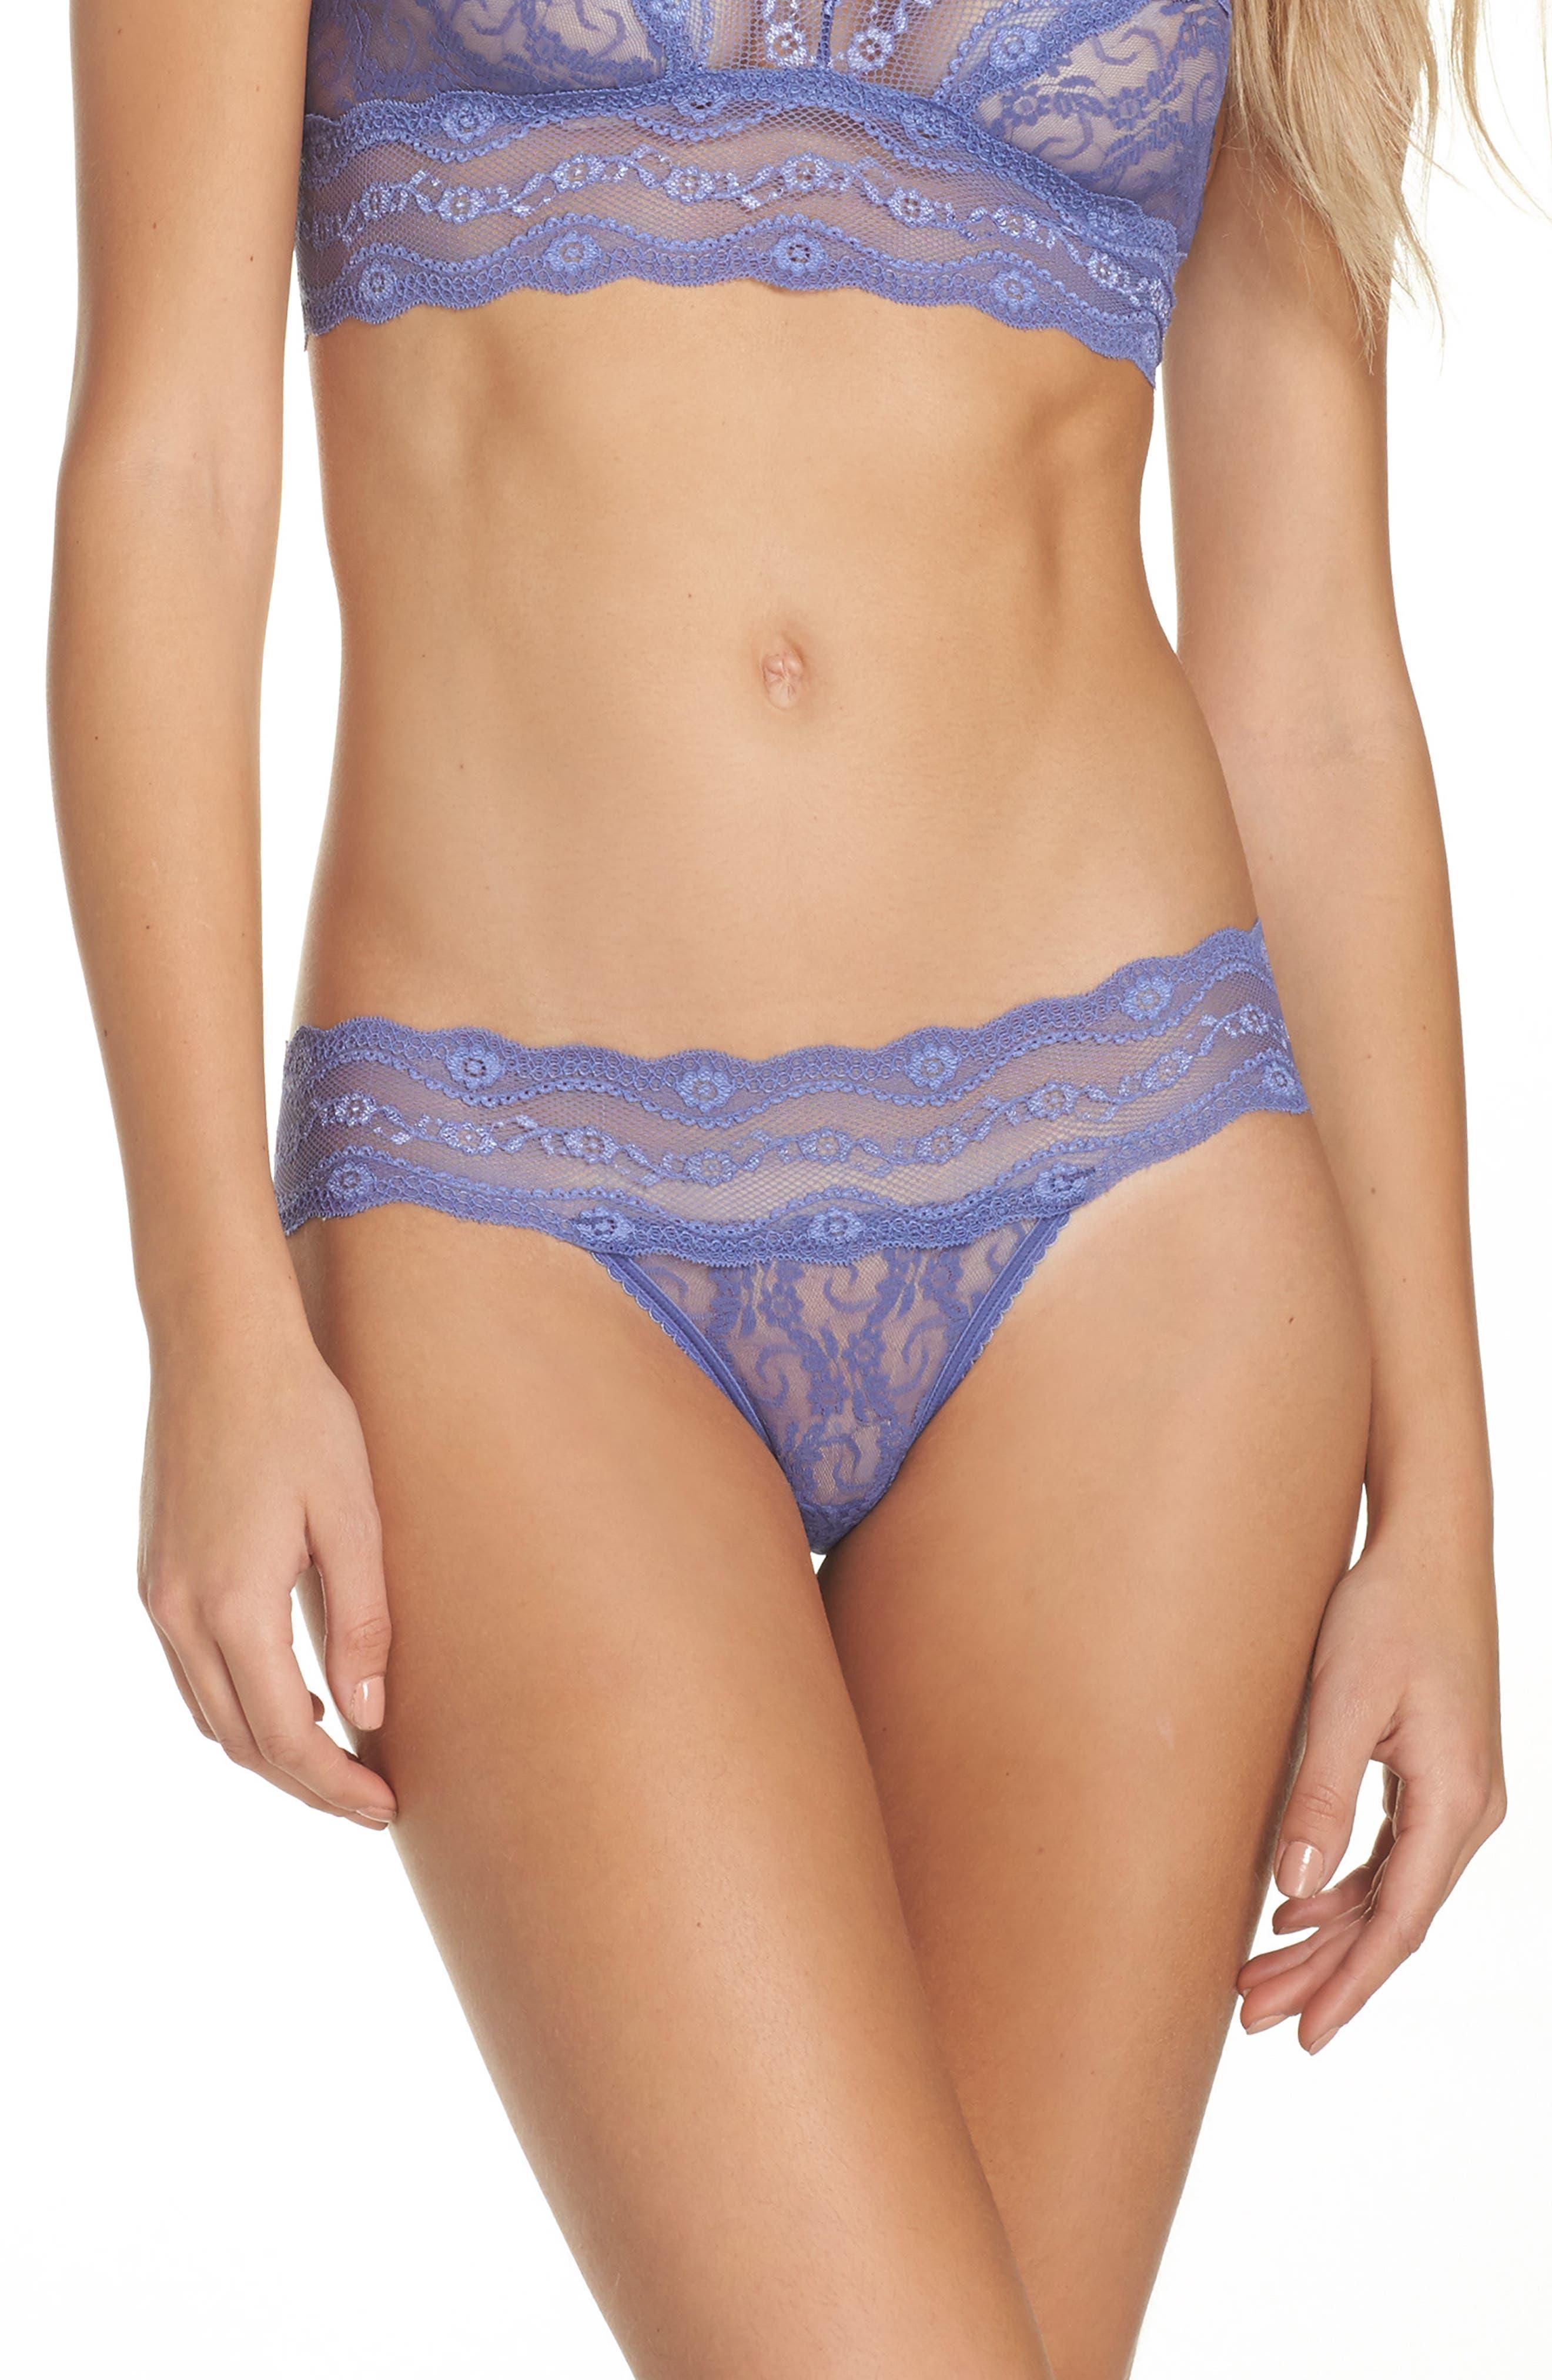 Alternate Image 1 Selected - b.tempt'd by Wacoal 'Lace Kiss' Bikini (3 for $33)